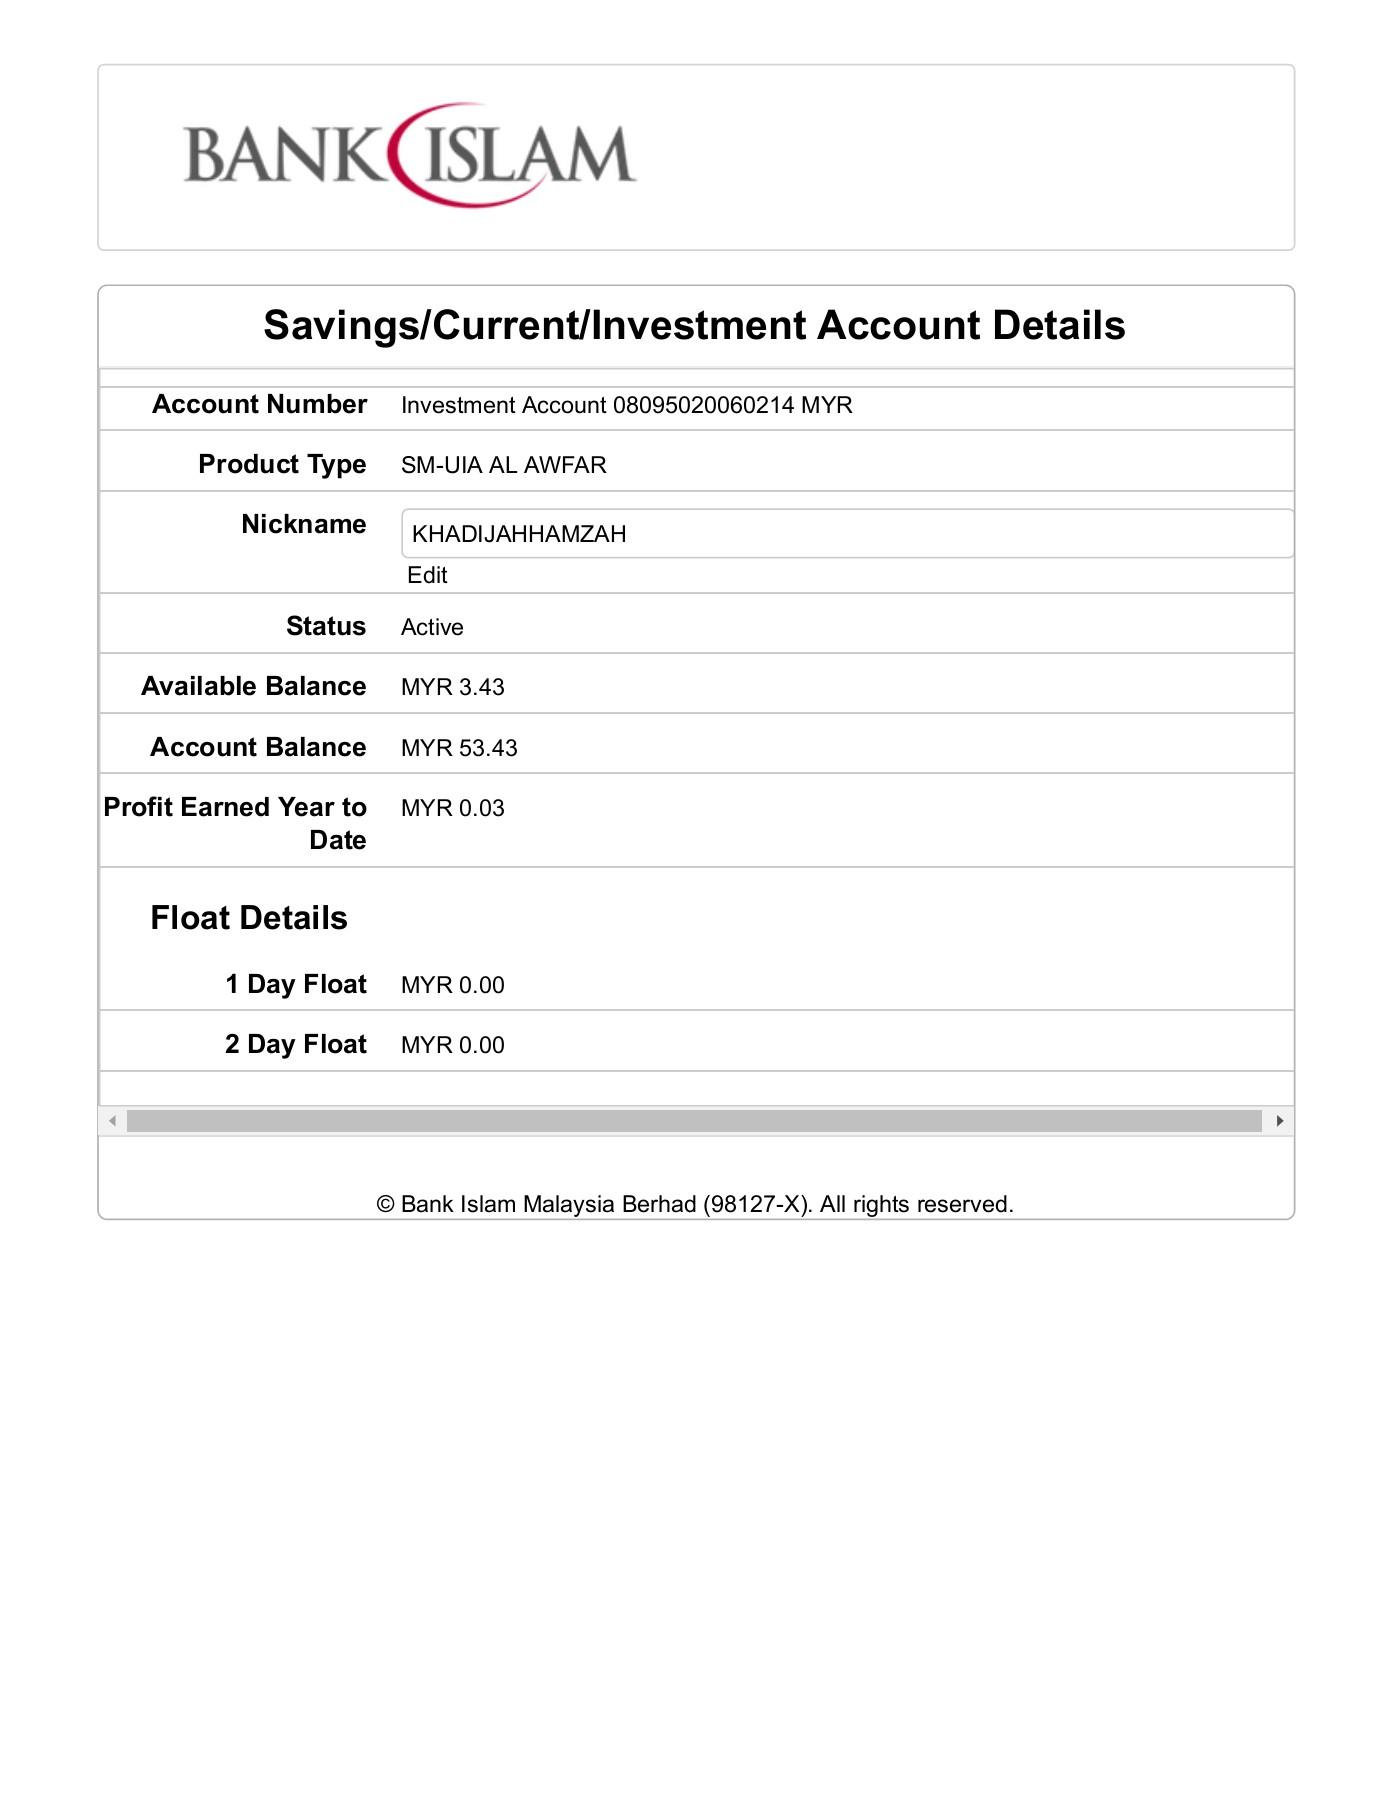 Bank Islam Ib Details